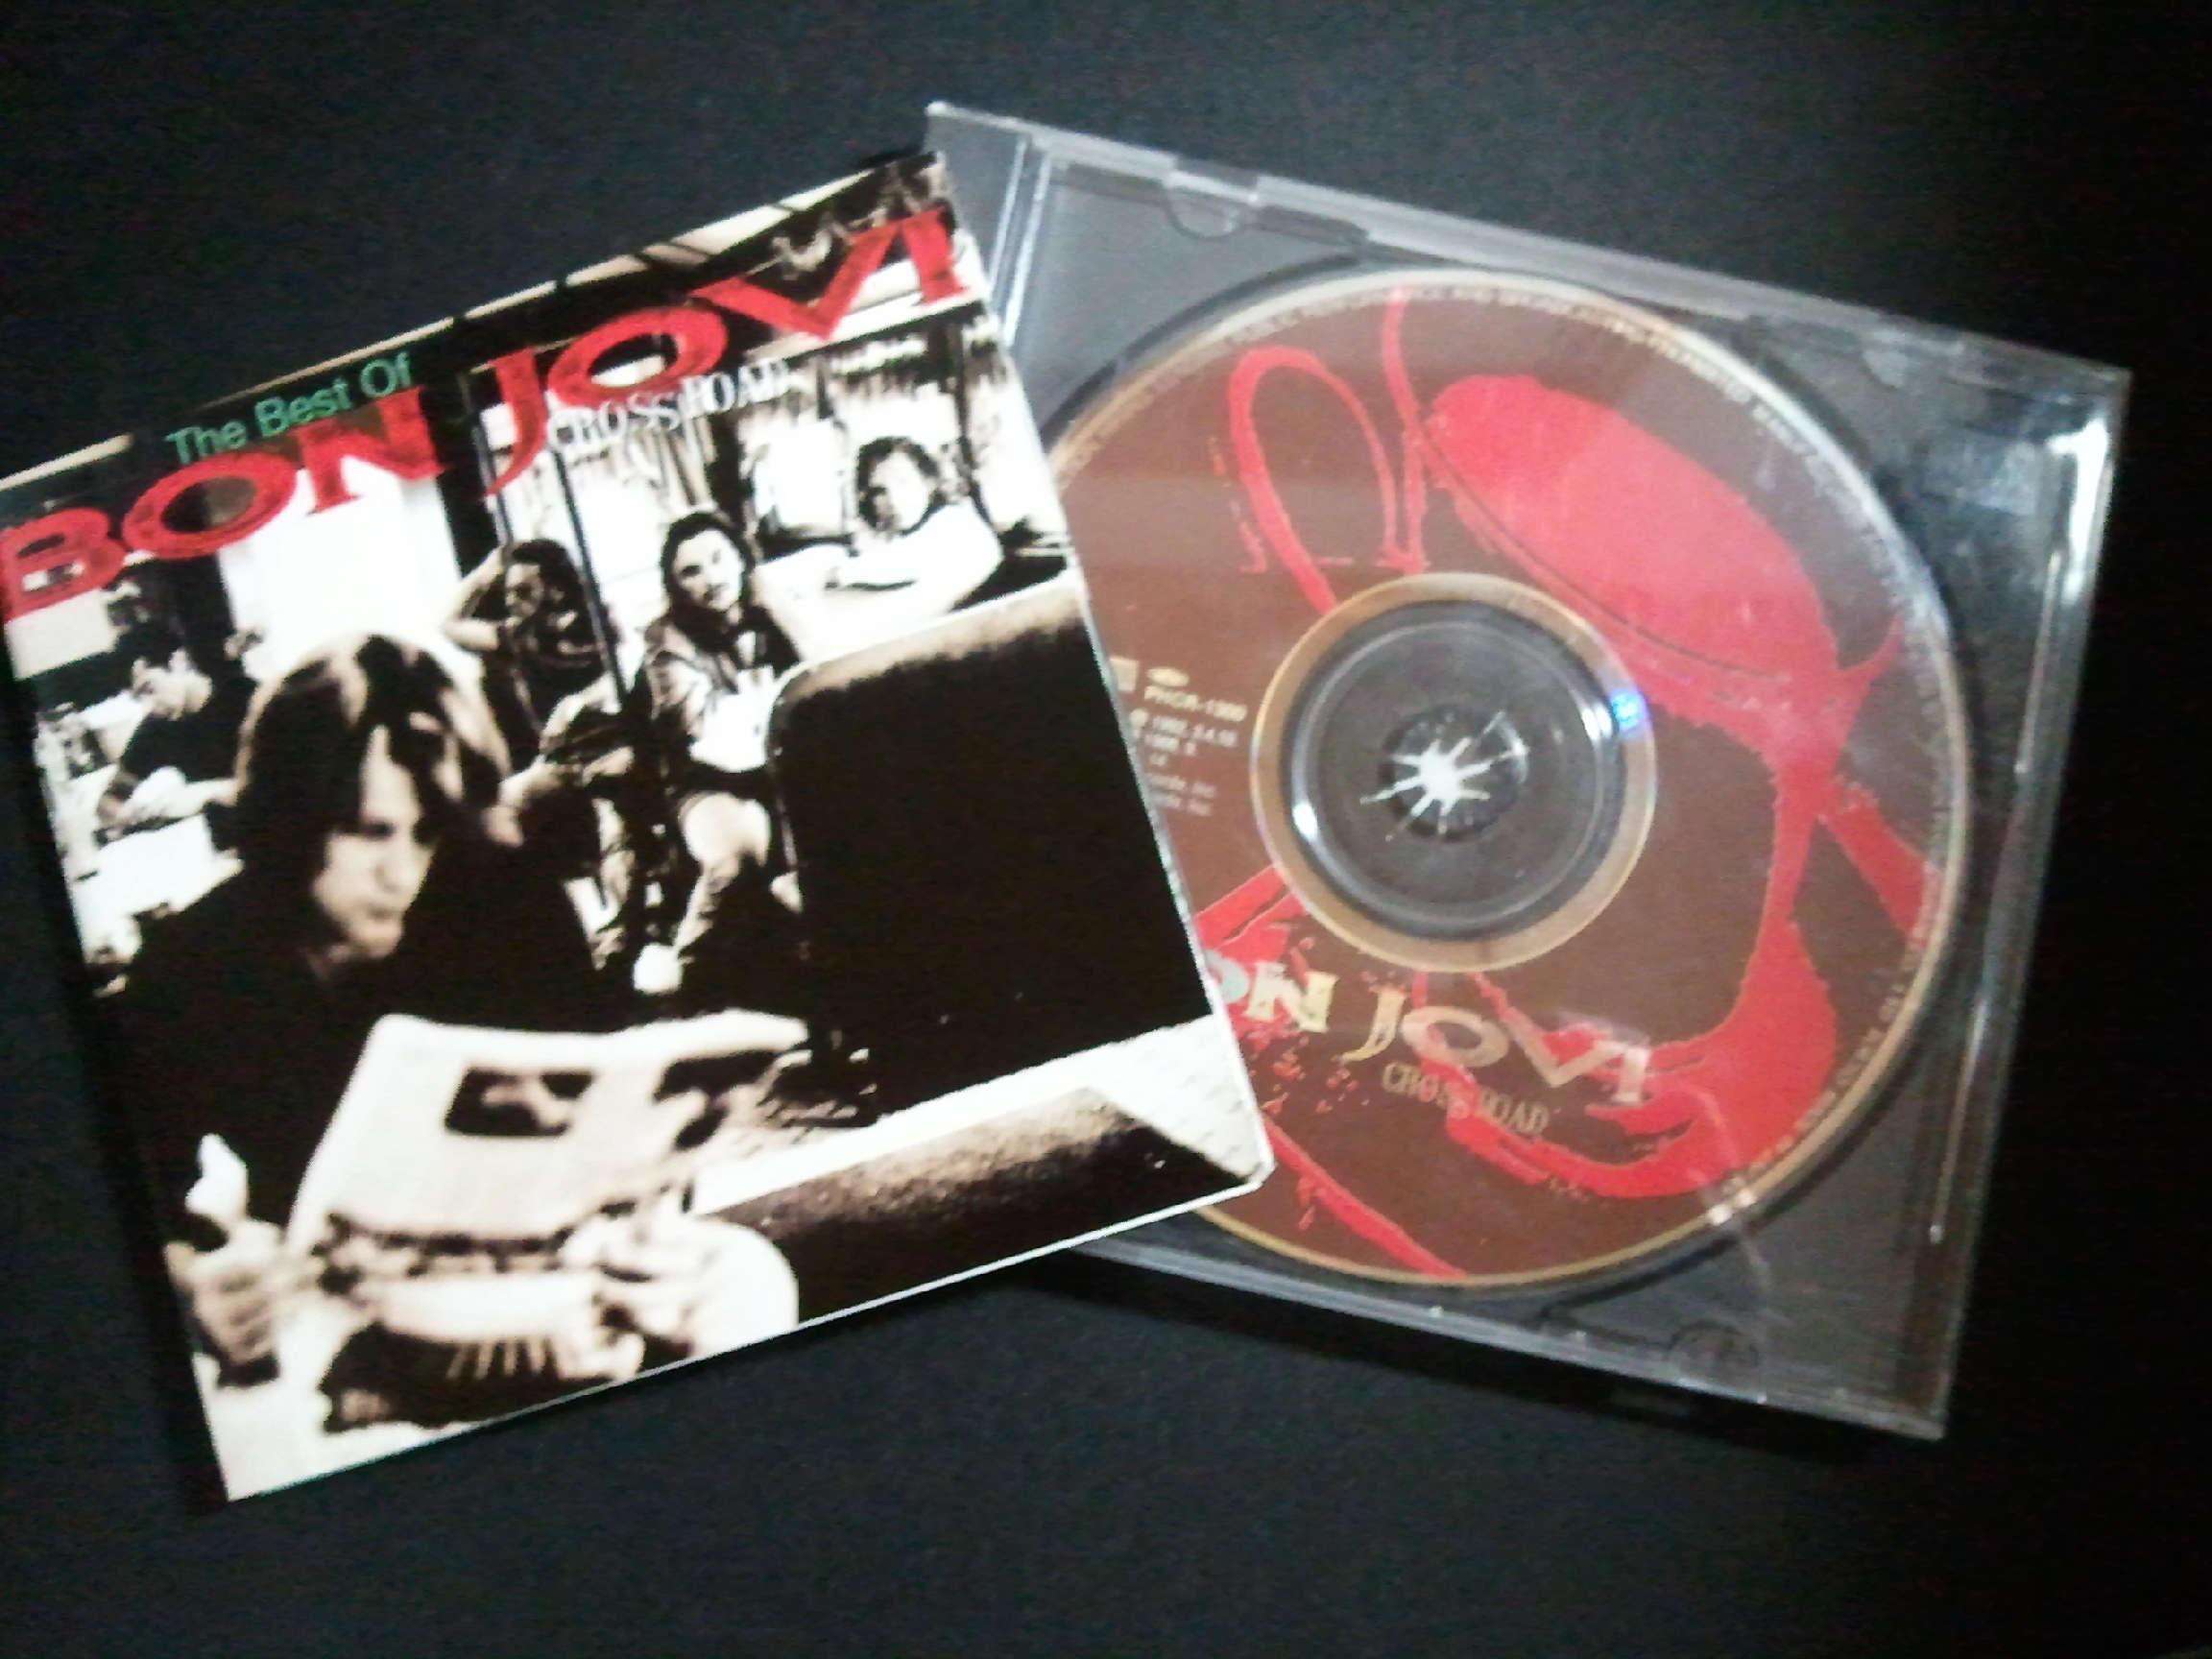 The Best of Bon Jovi Cross Road